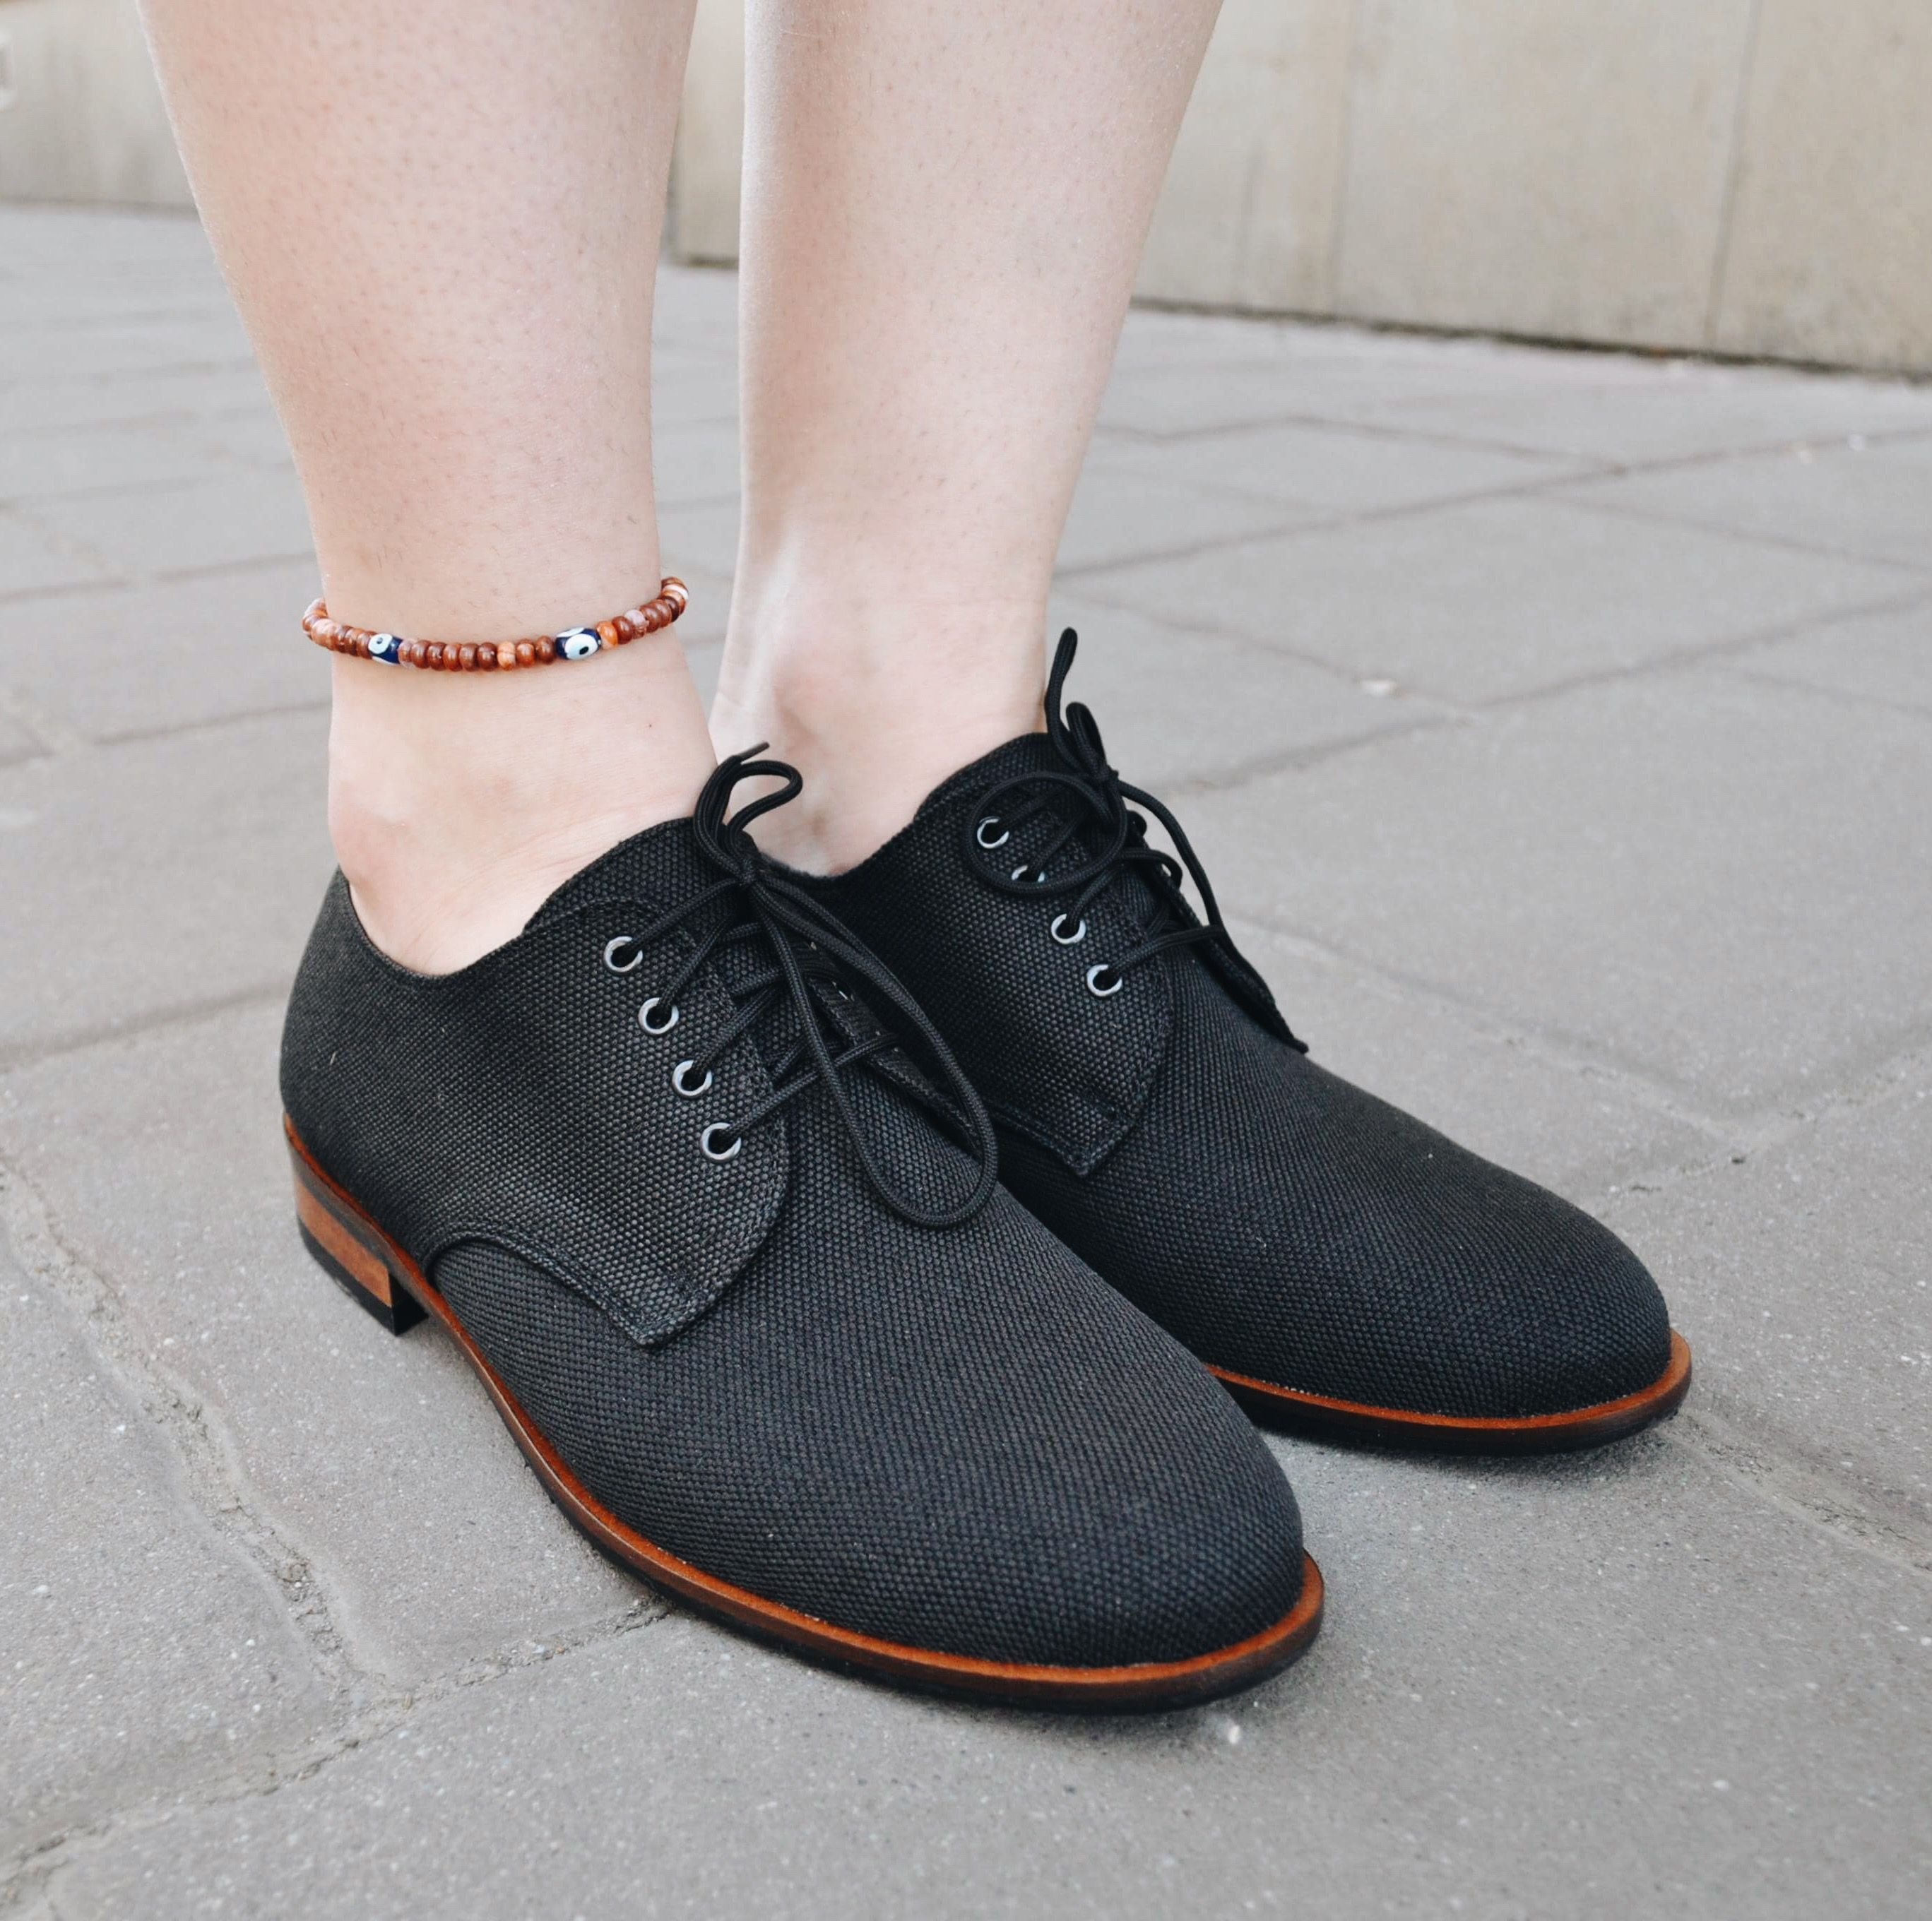 Polbuty By Izabella Krzysiek Www Fairma Pl Veganshoes Ethicalfashion Fairtrade Sustainable Fair Vegan Shoes All Black Sneakers Black Sneaker